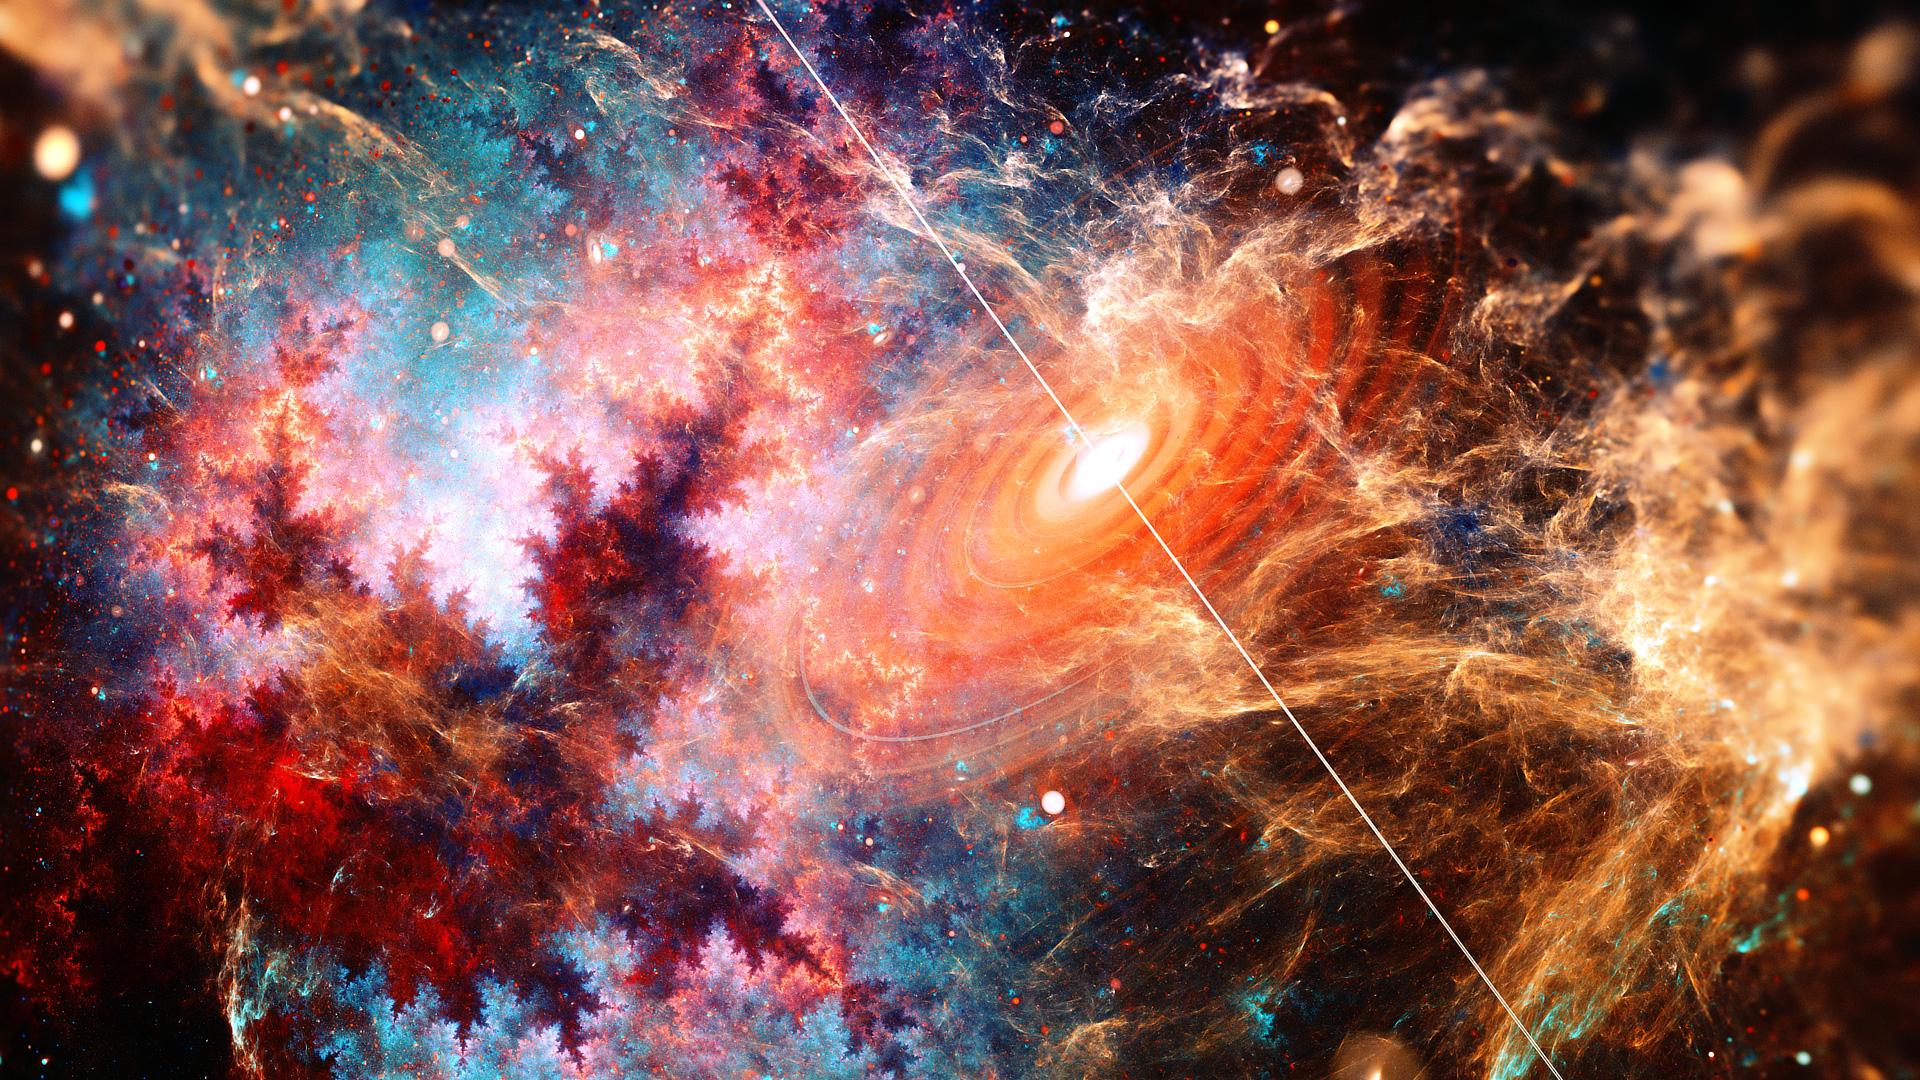 3840x2400 Beautiful Galaxy Fractal Art 4k HD 4k Wallpapers ...